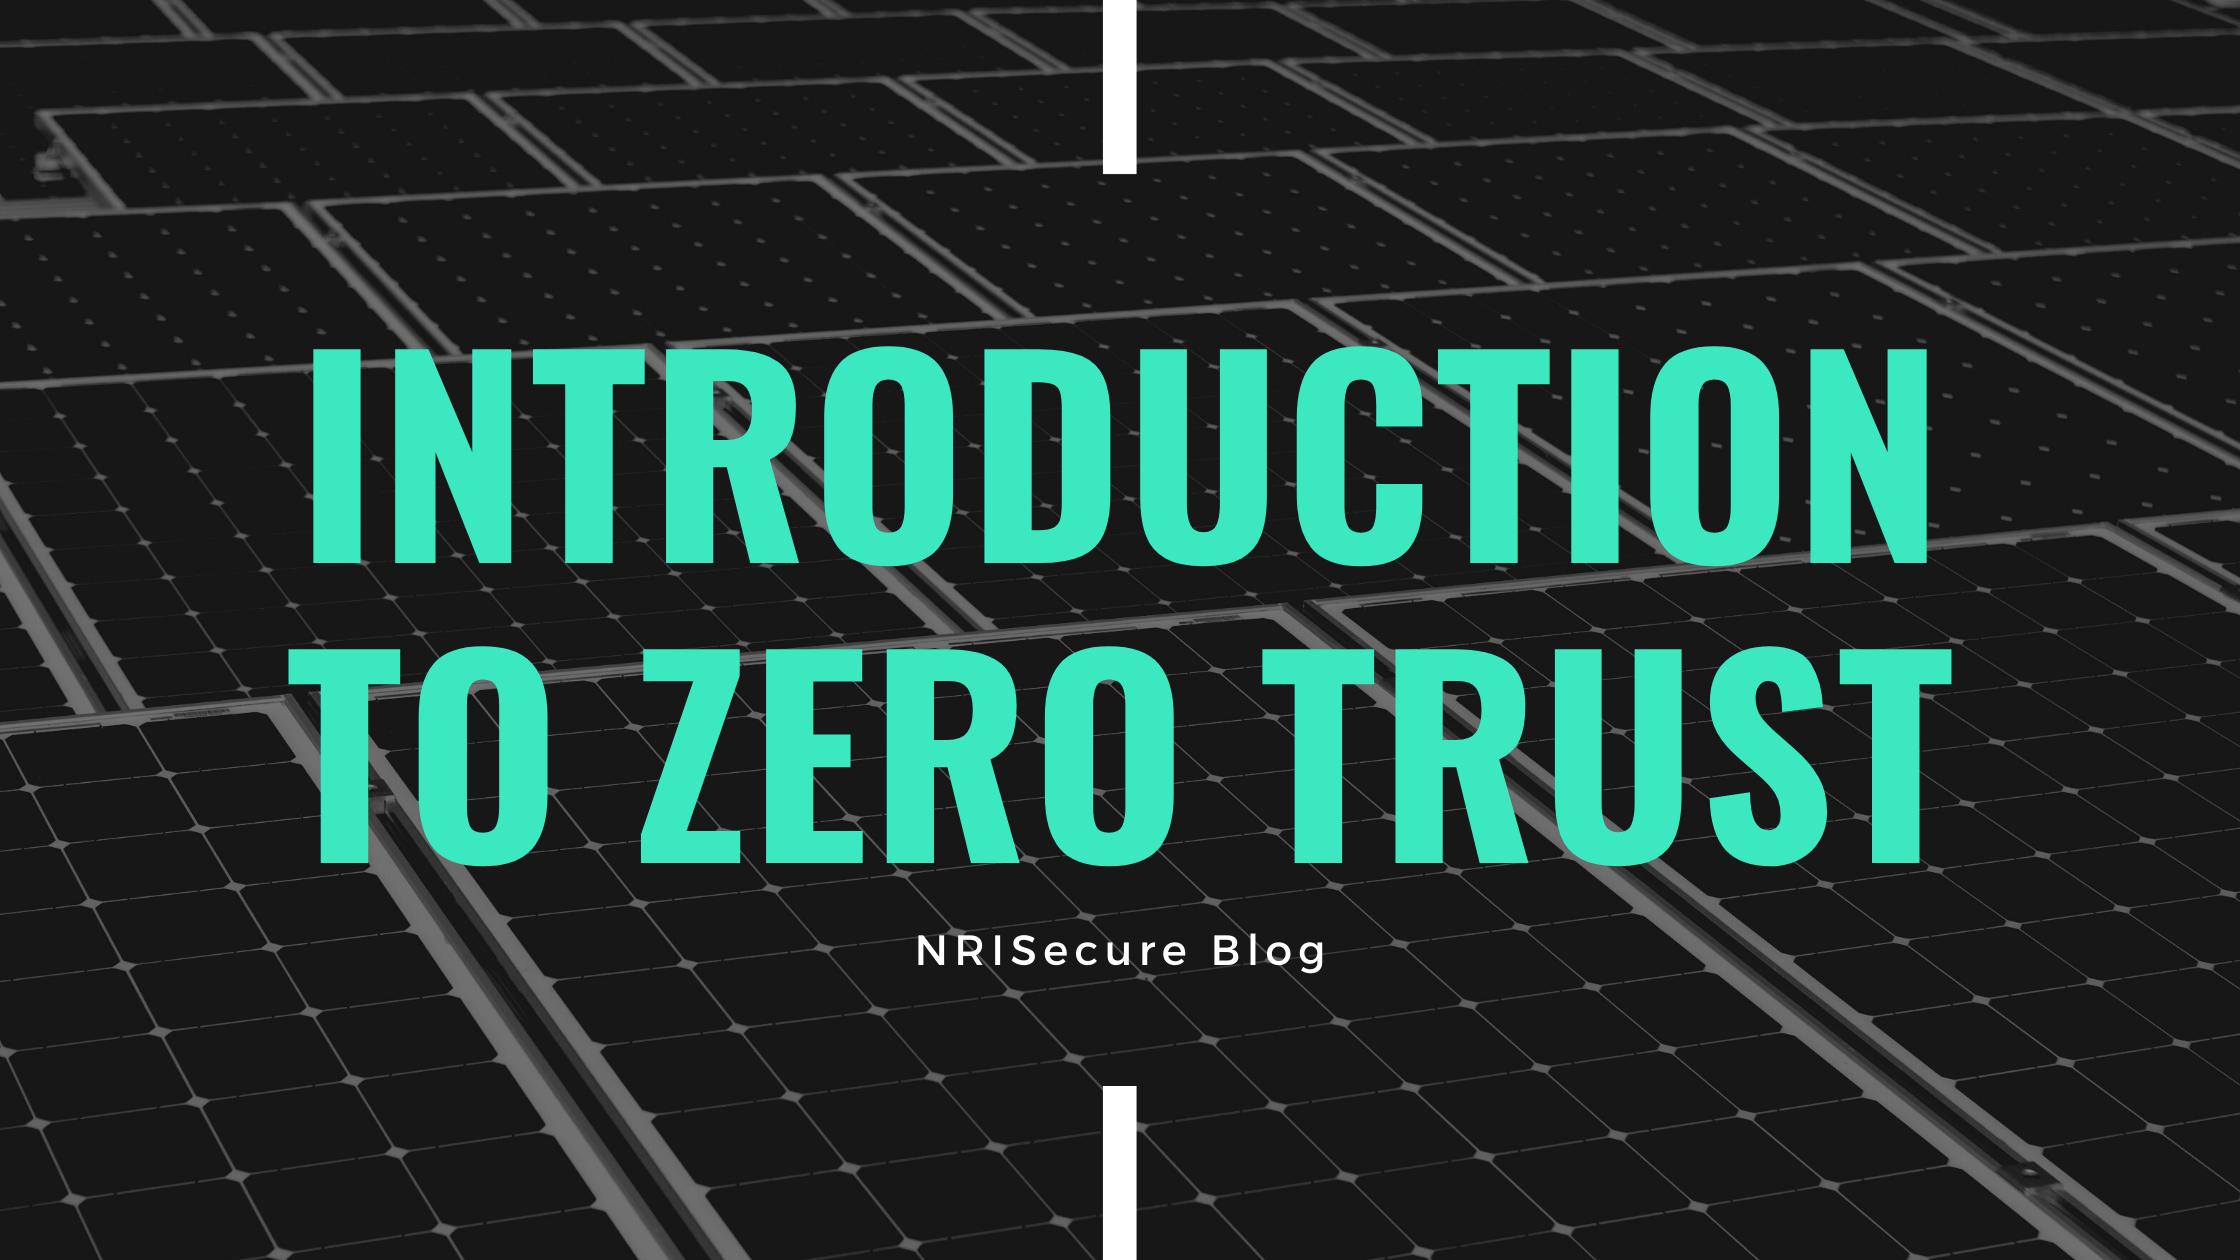 Introduction to Zero Trust